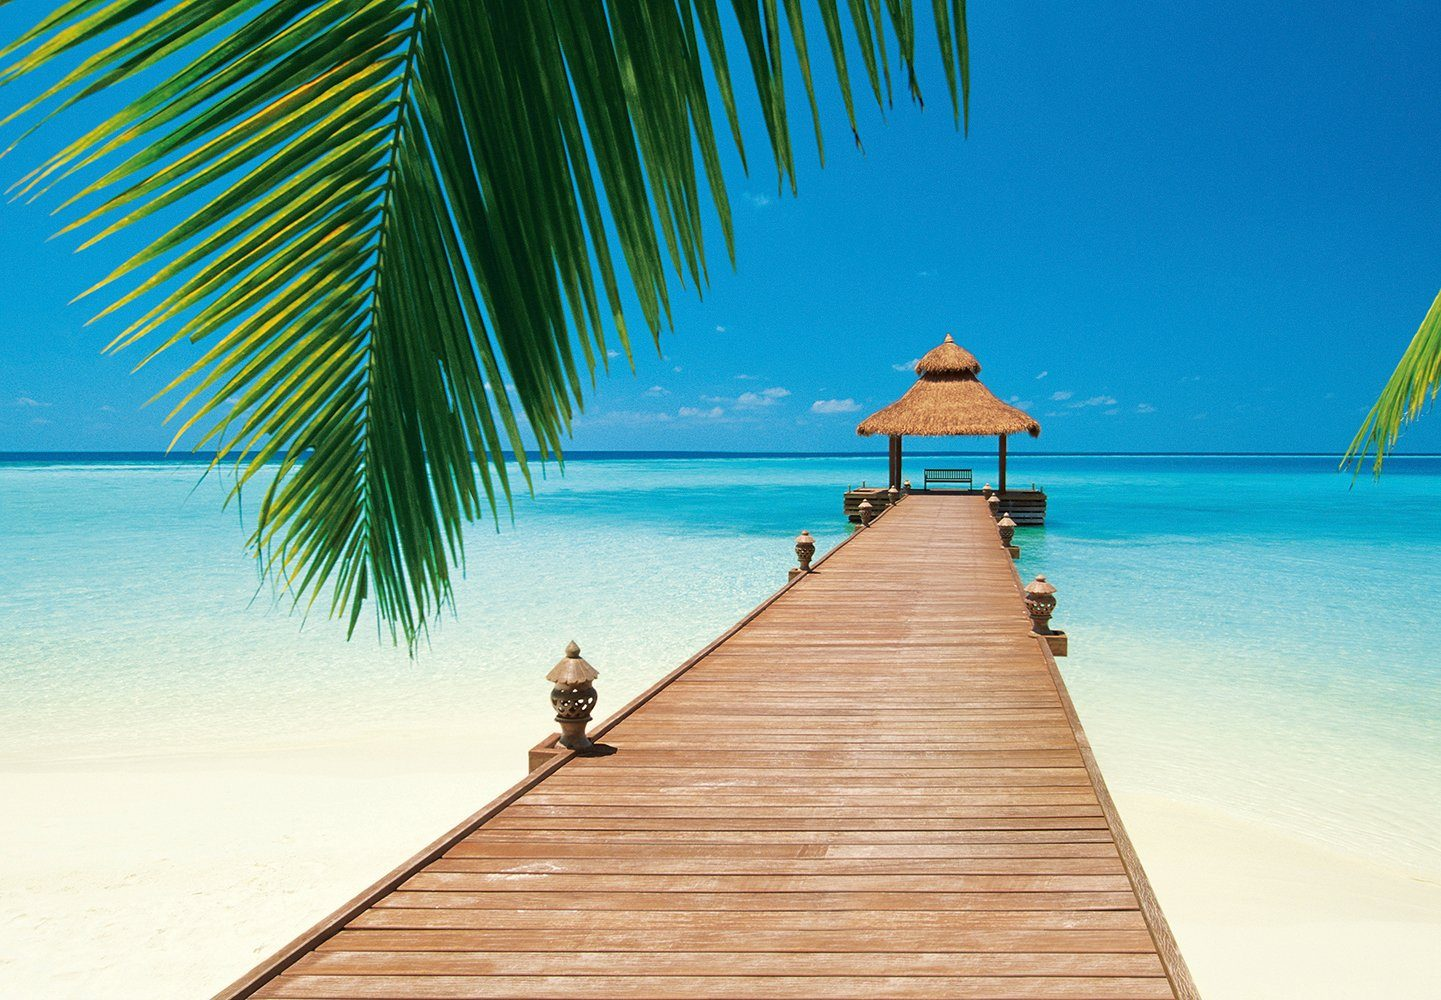 Fototapete »Paradise Beach«, 8-teilig, 366x254 cm